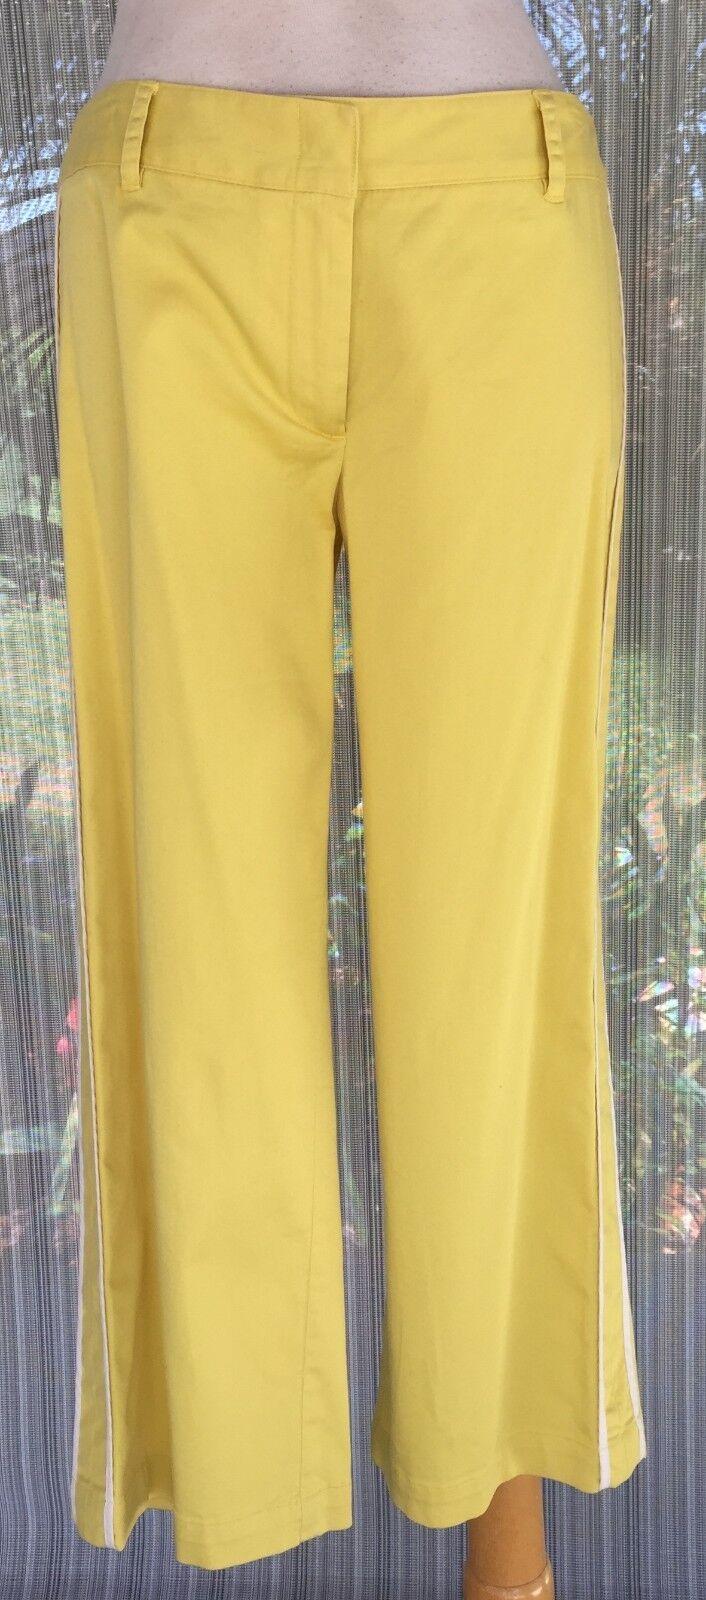 BCBG MAX AZRIA Stretch Cotton Crop Pant New 2 4 6 8 XS S M Yellow White  134 NWT